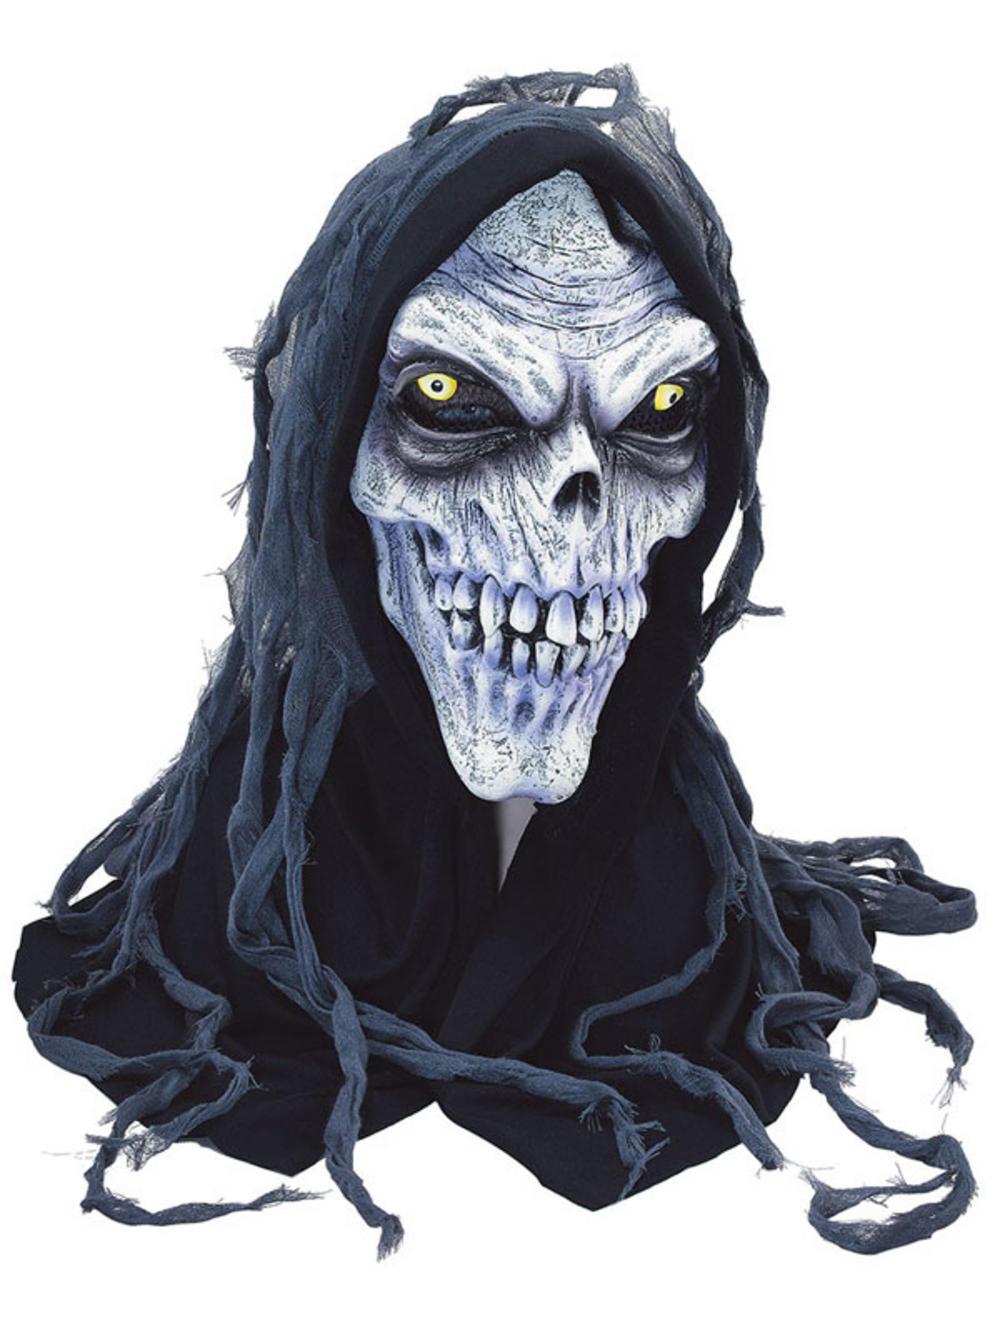 Hooded Zombie Corpse Ghoul Skull Skeleton Halloween Rubber Mask ...